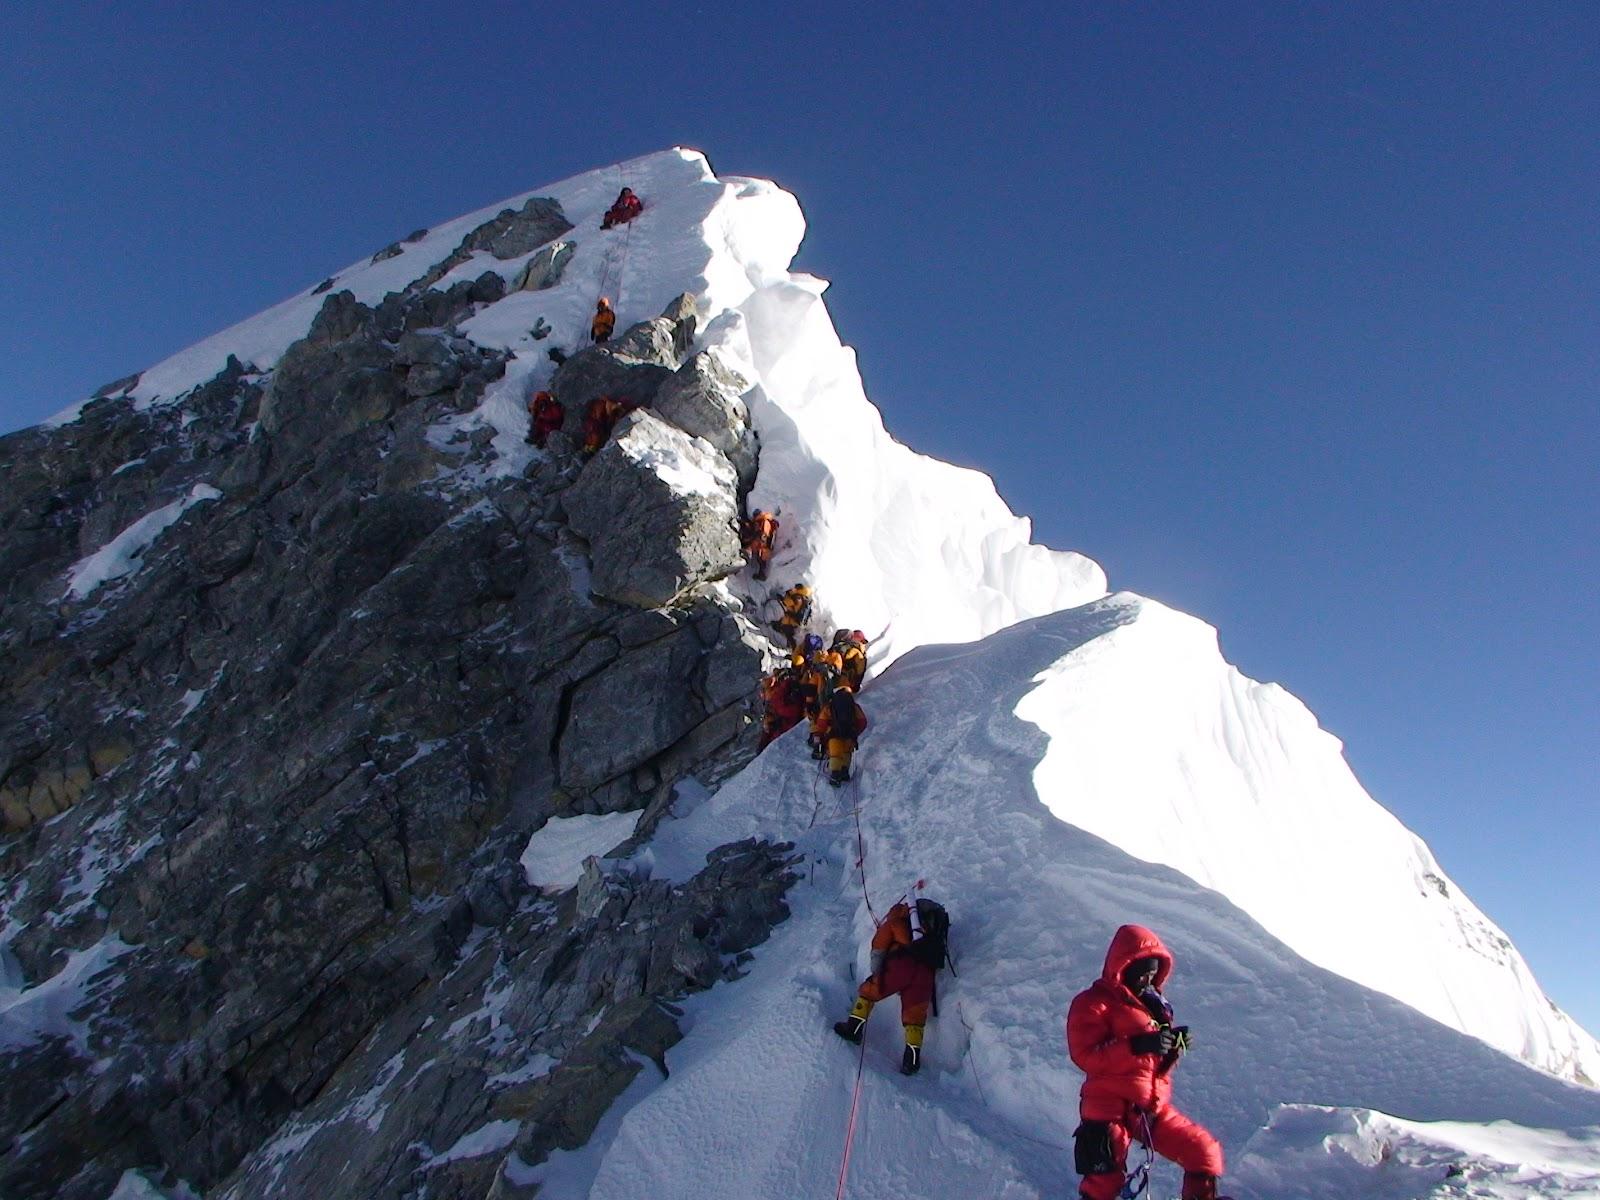 Woodland original: 'ProPlanet climbs Everest' to spread ...